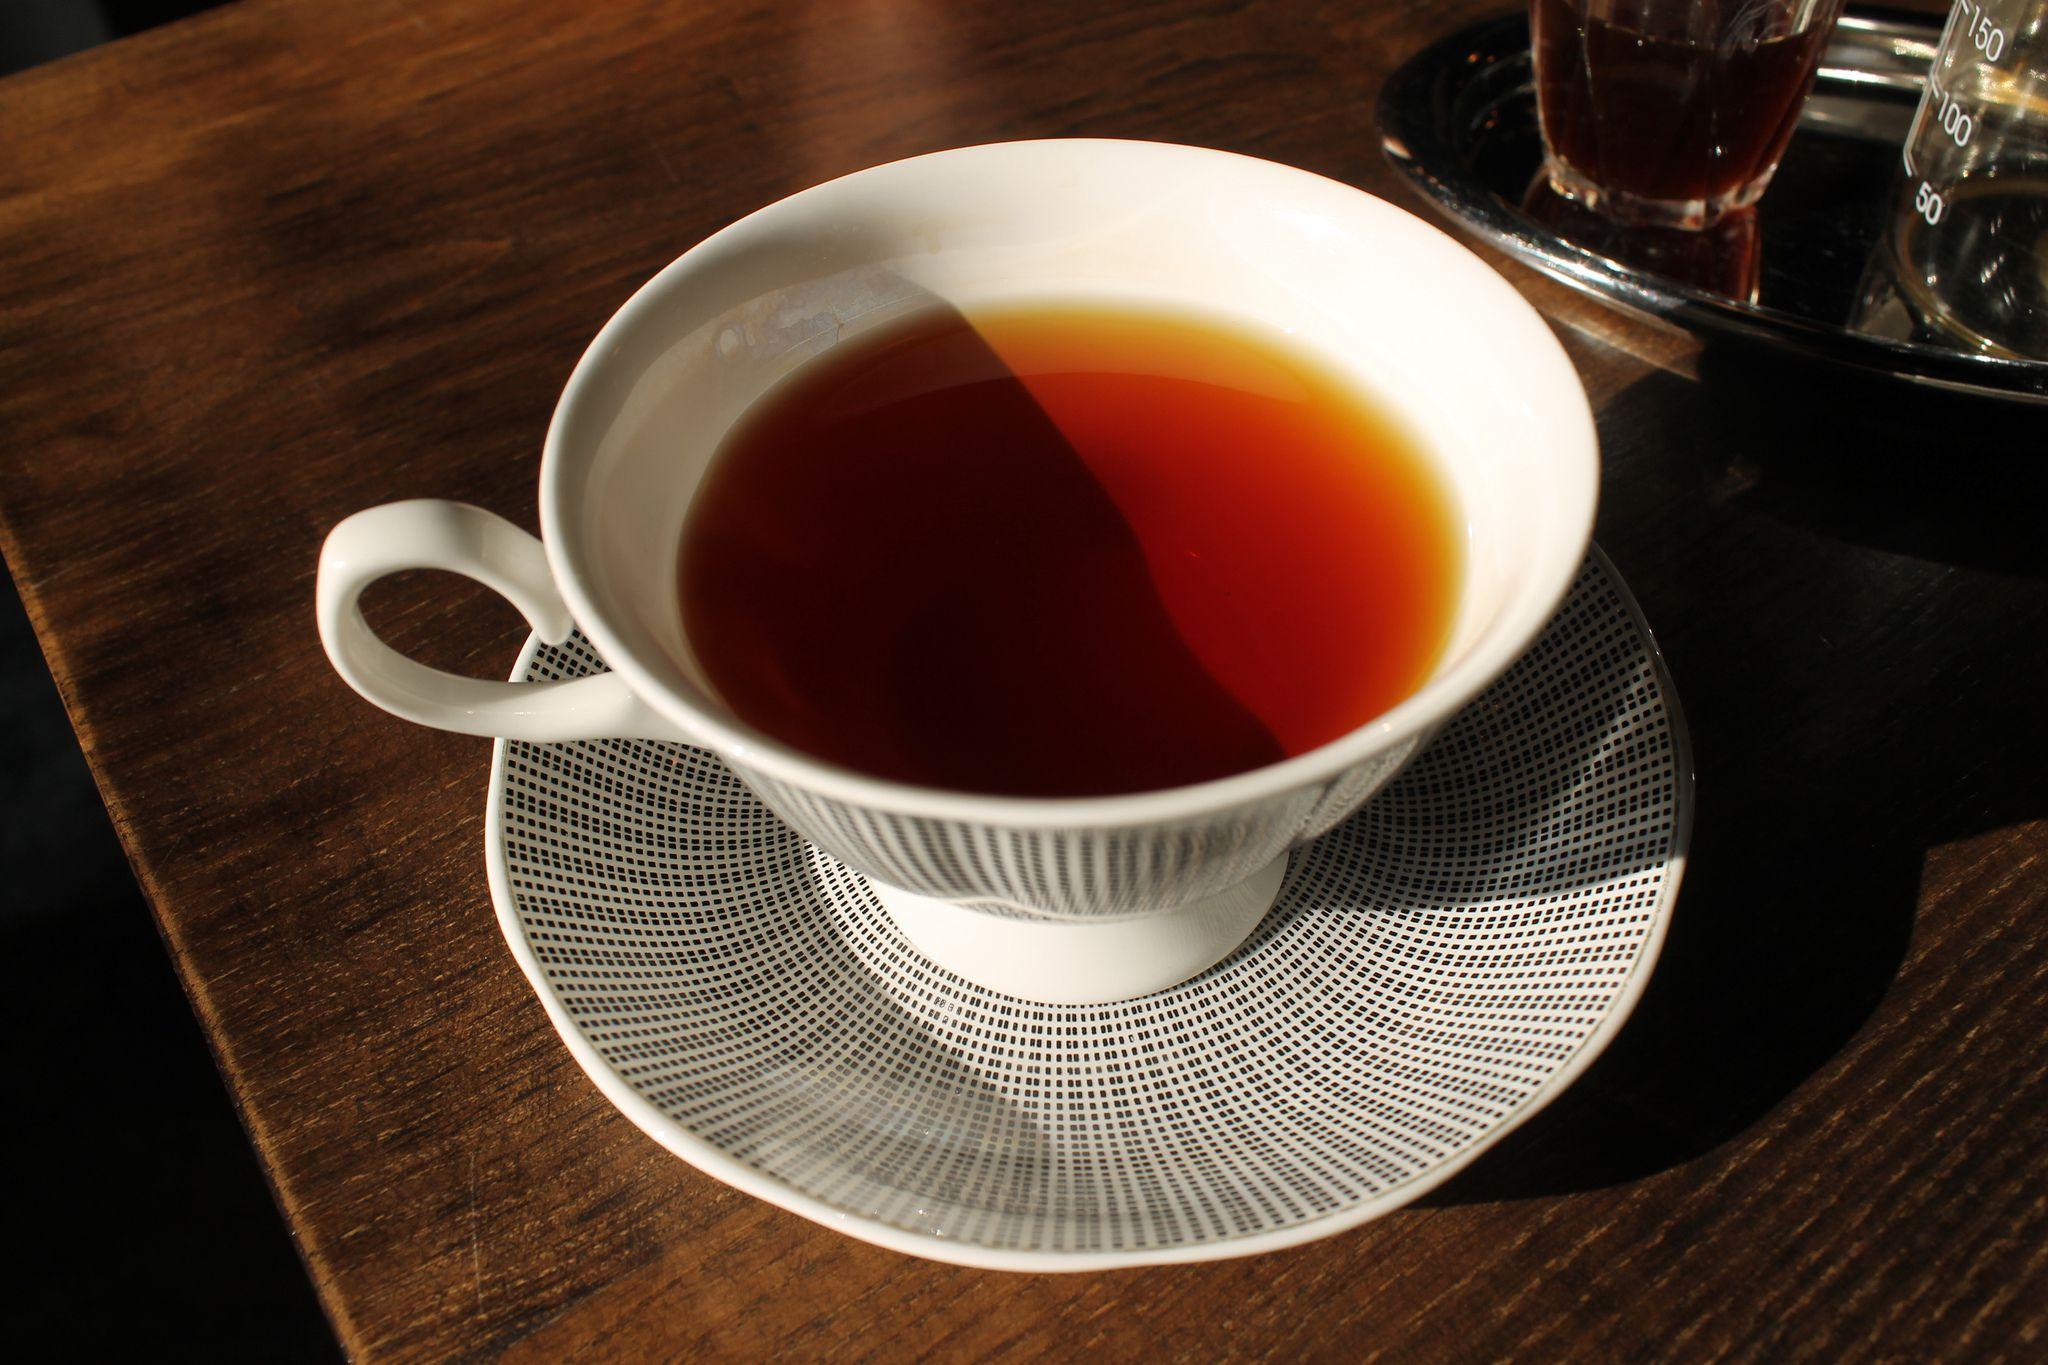 cup-of-tea-56a8cf2f3df78cf772a0da15.jpg